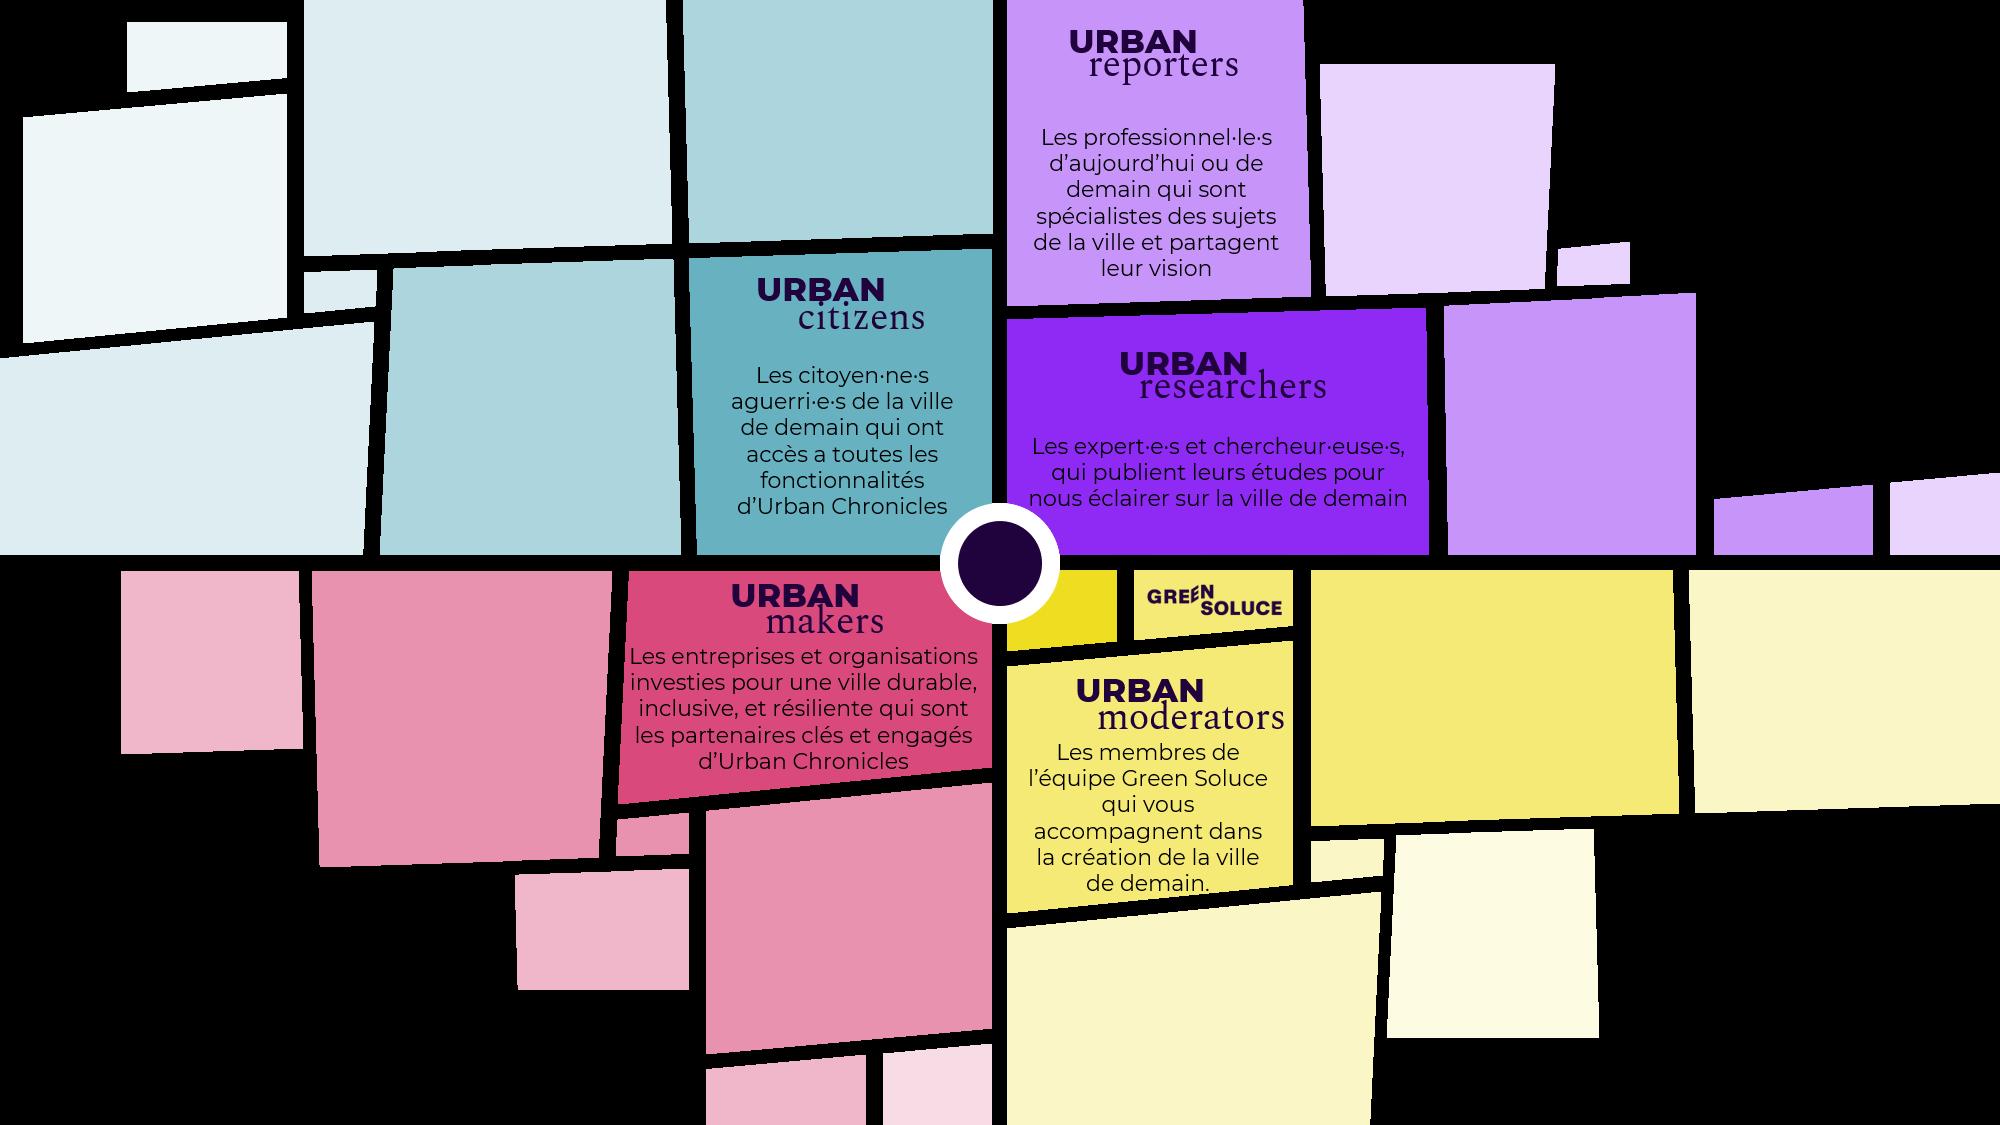 Urban communities - Ligtht